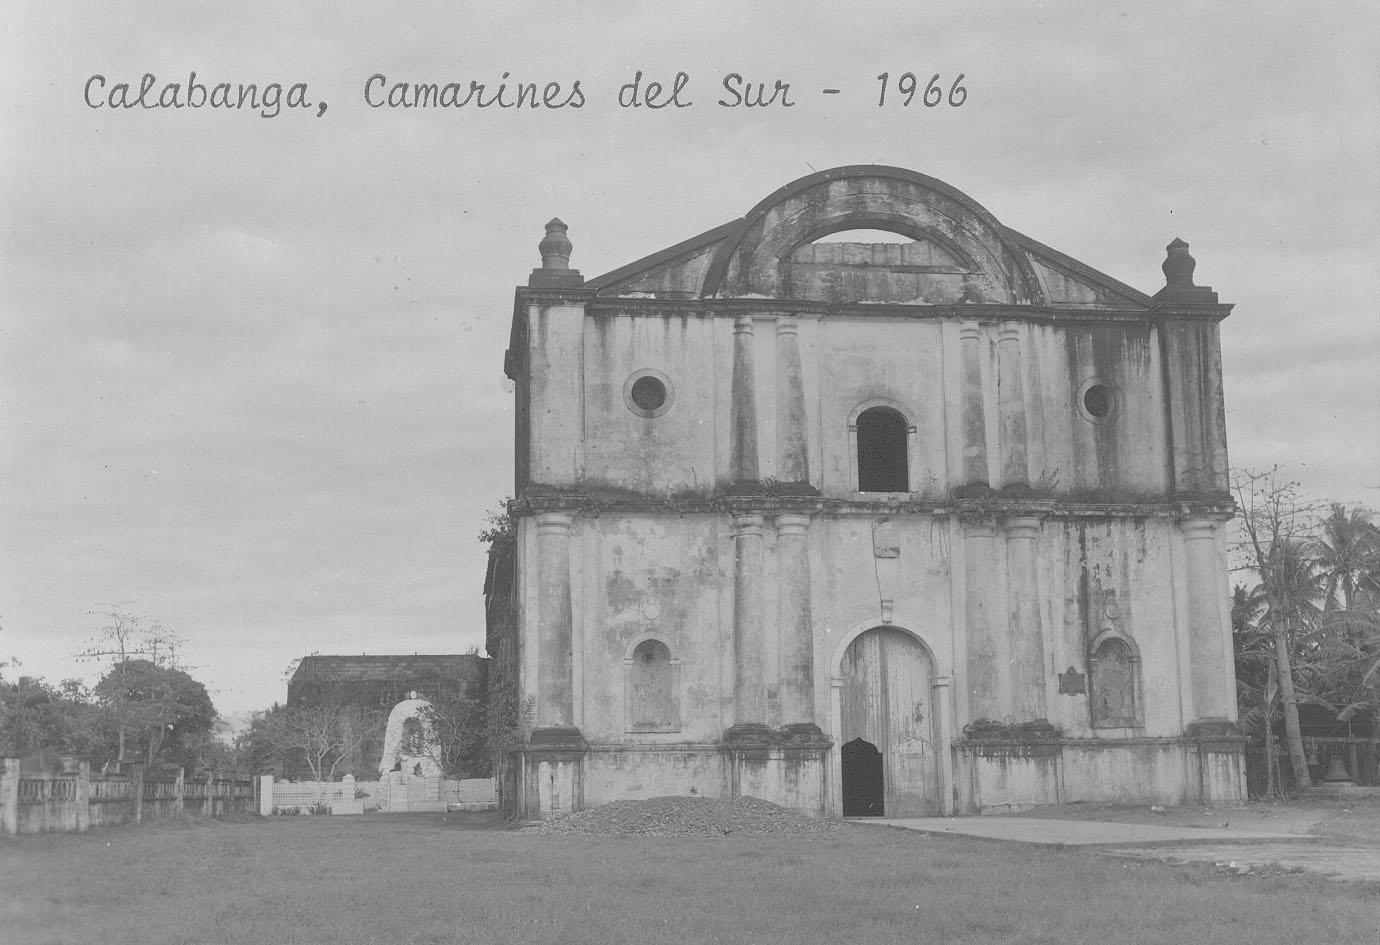 Calabanga Philippines  city images : Print Photos | View Full Size Image